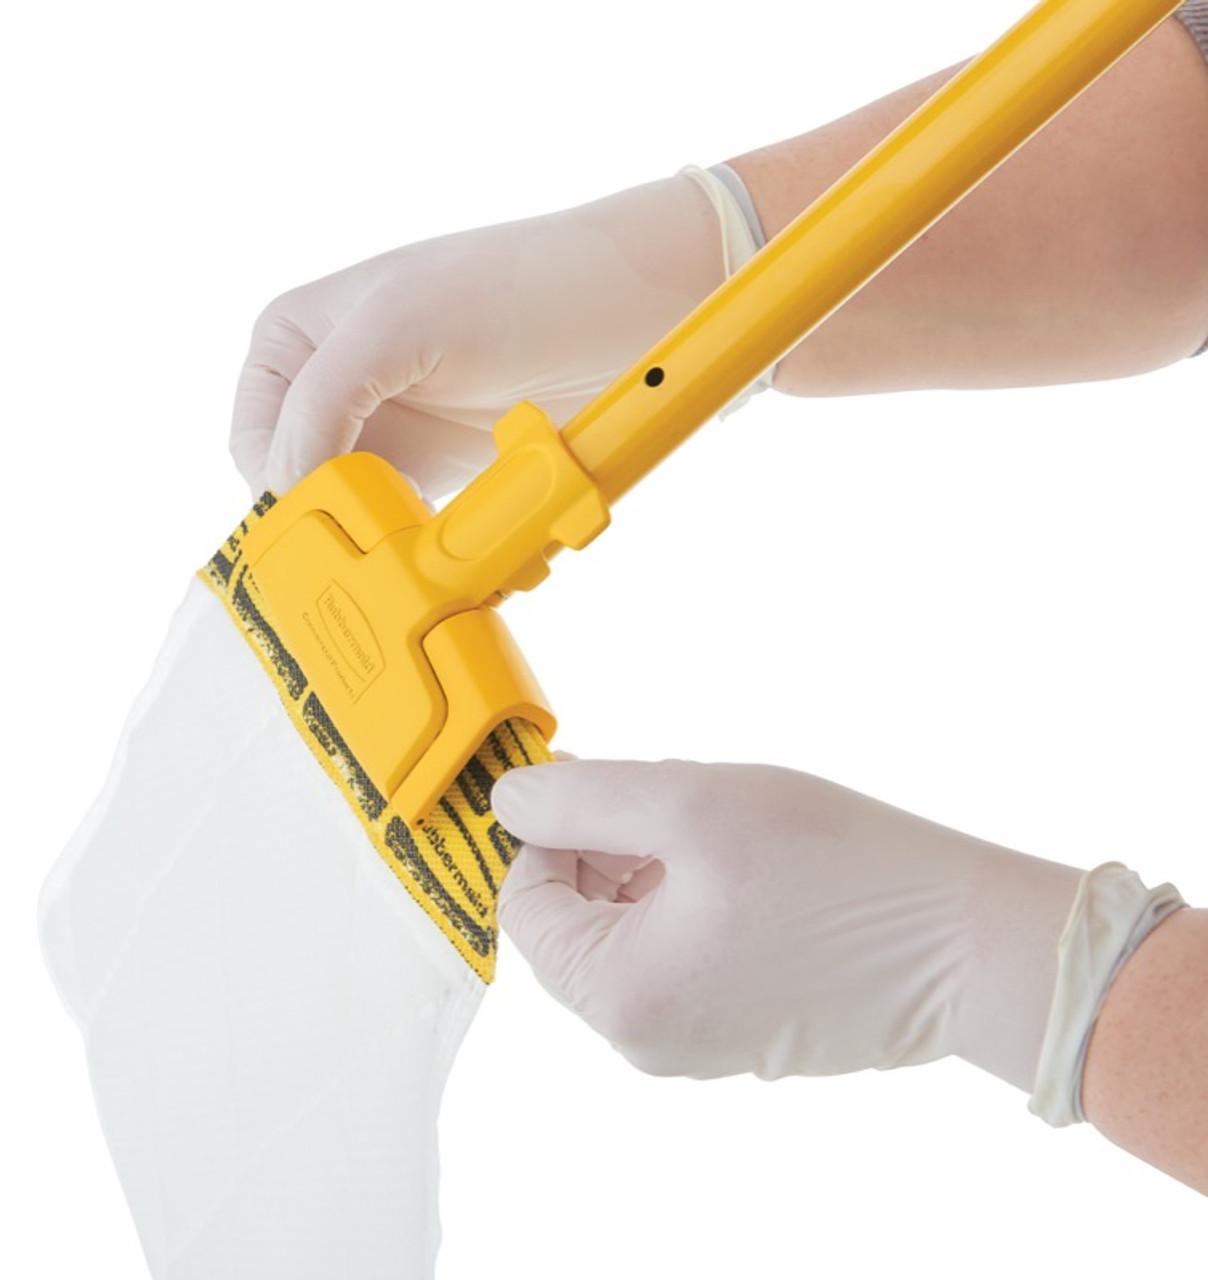 Rubbermaid Spill Mop Handle